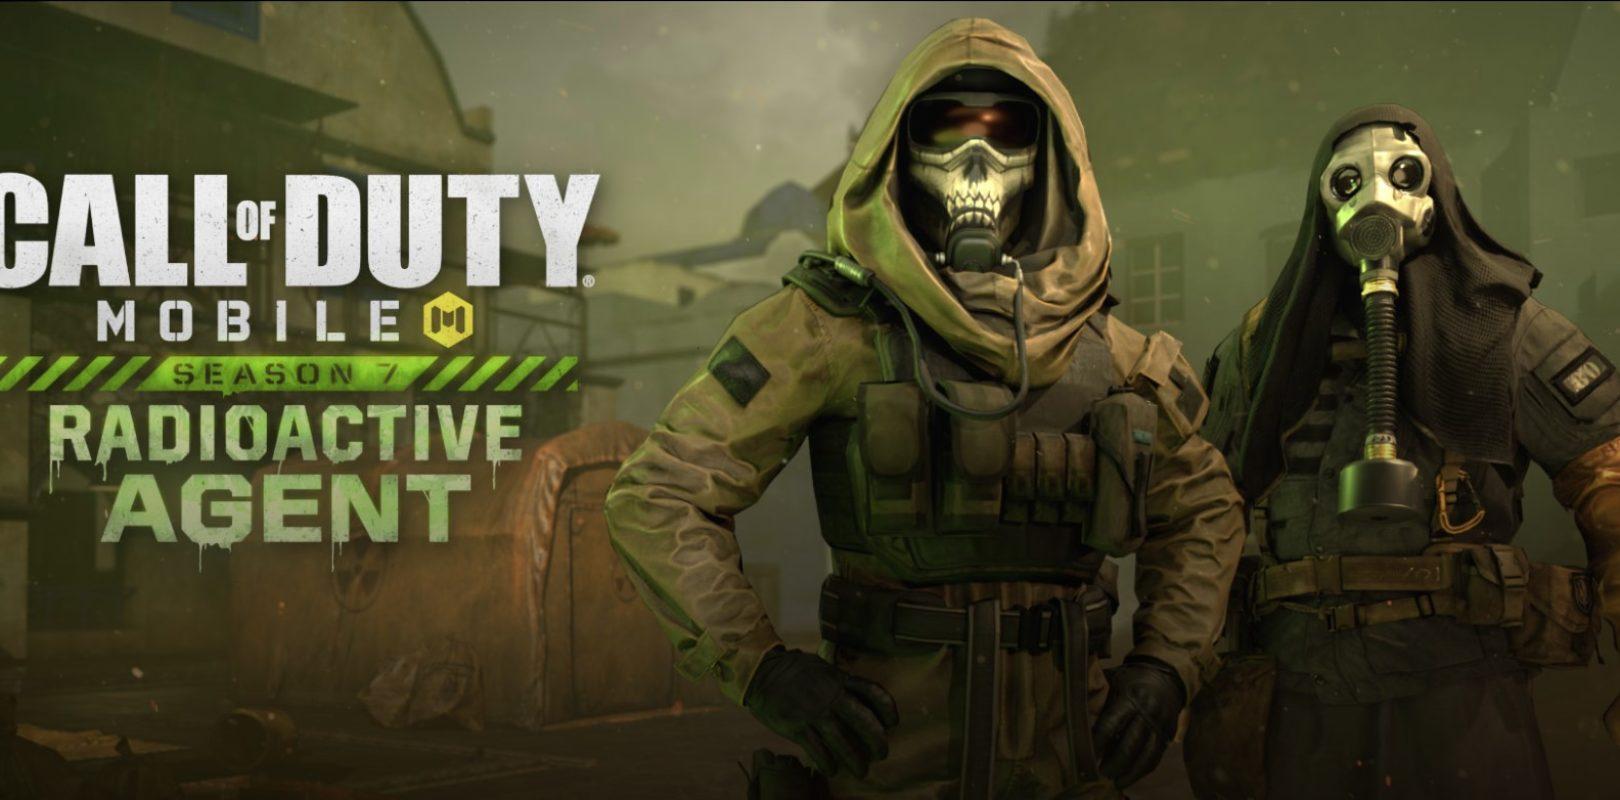 Llega la Temporada 7 a Call of Duty: Mobile – Zona MMORPG